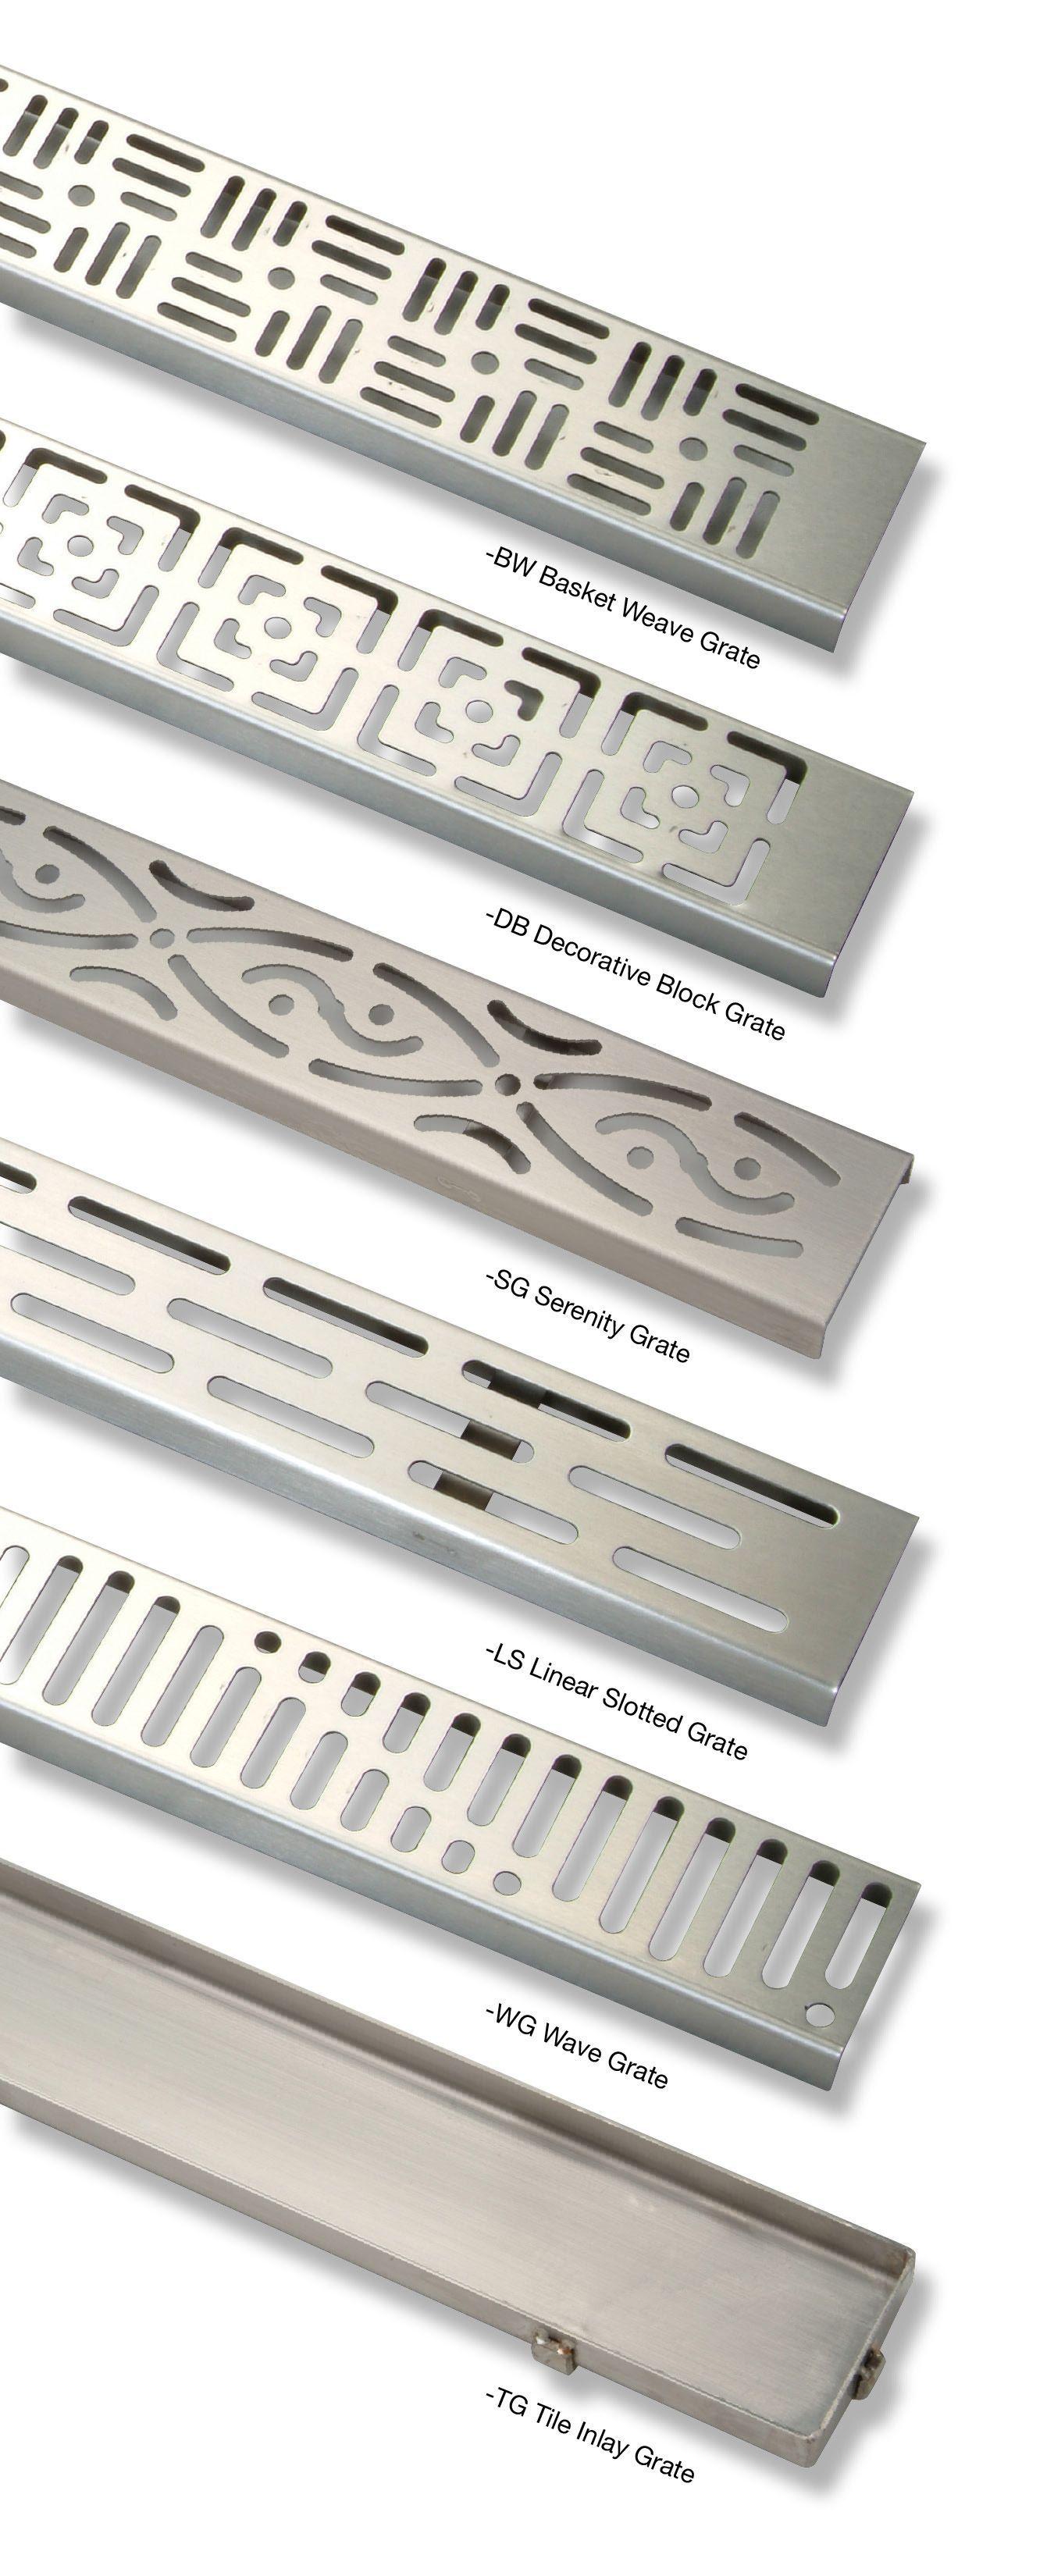 Zurn Zs880 Stainless Steel Linear Shower Drains